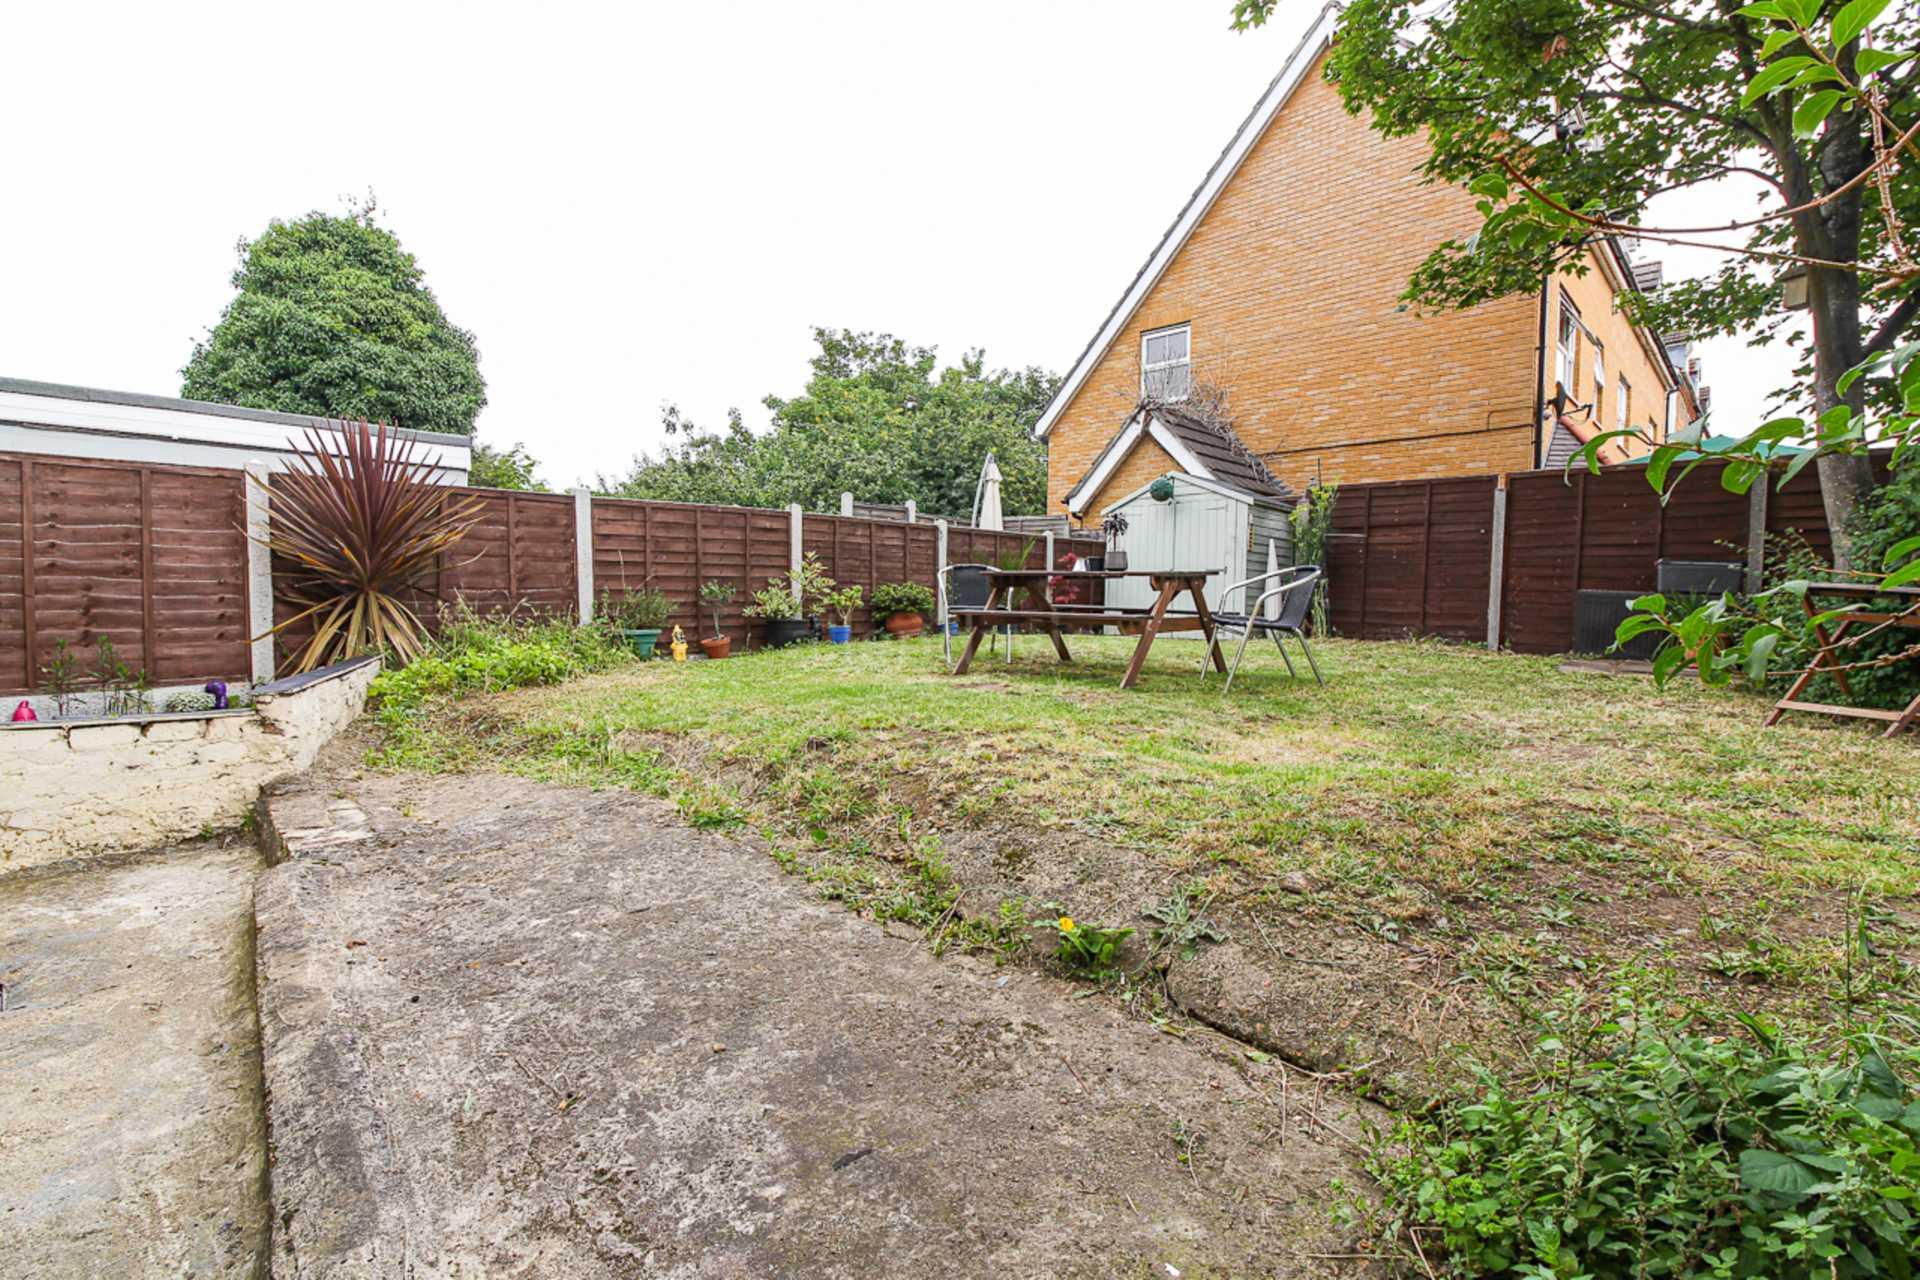 Oliver Road, Leyton, E10, Image 16